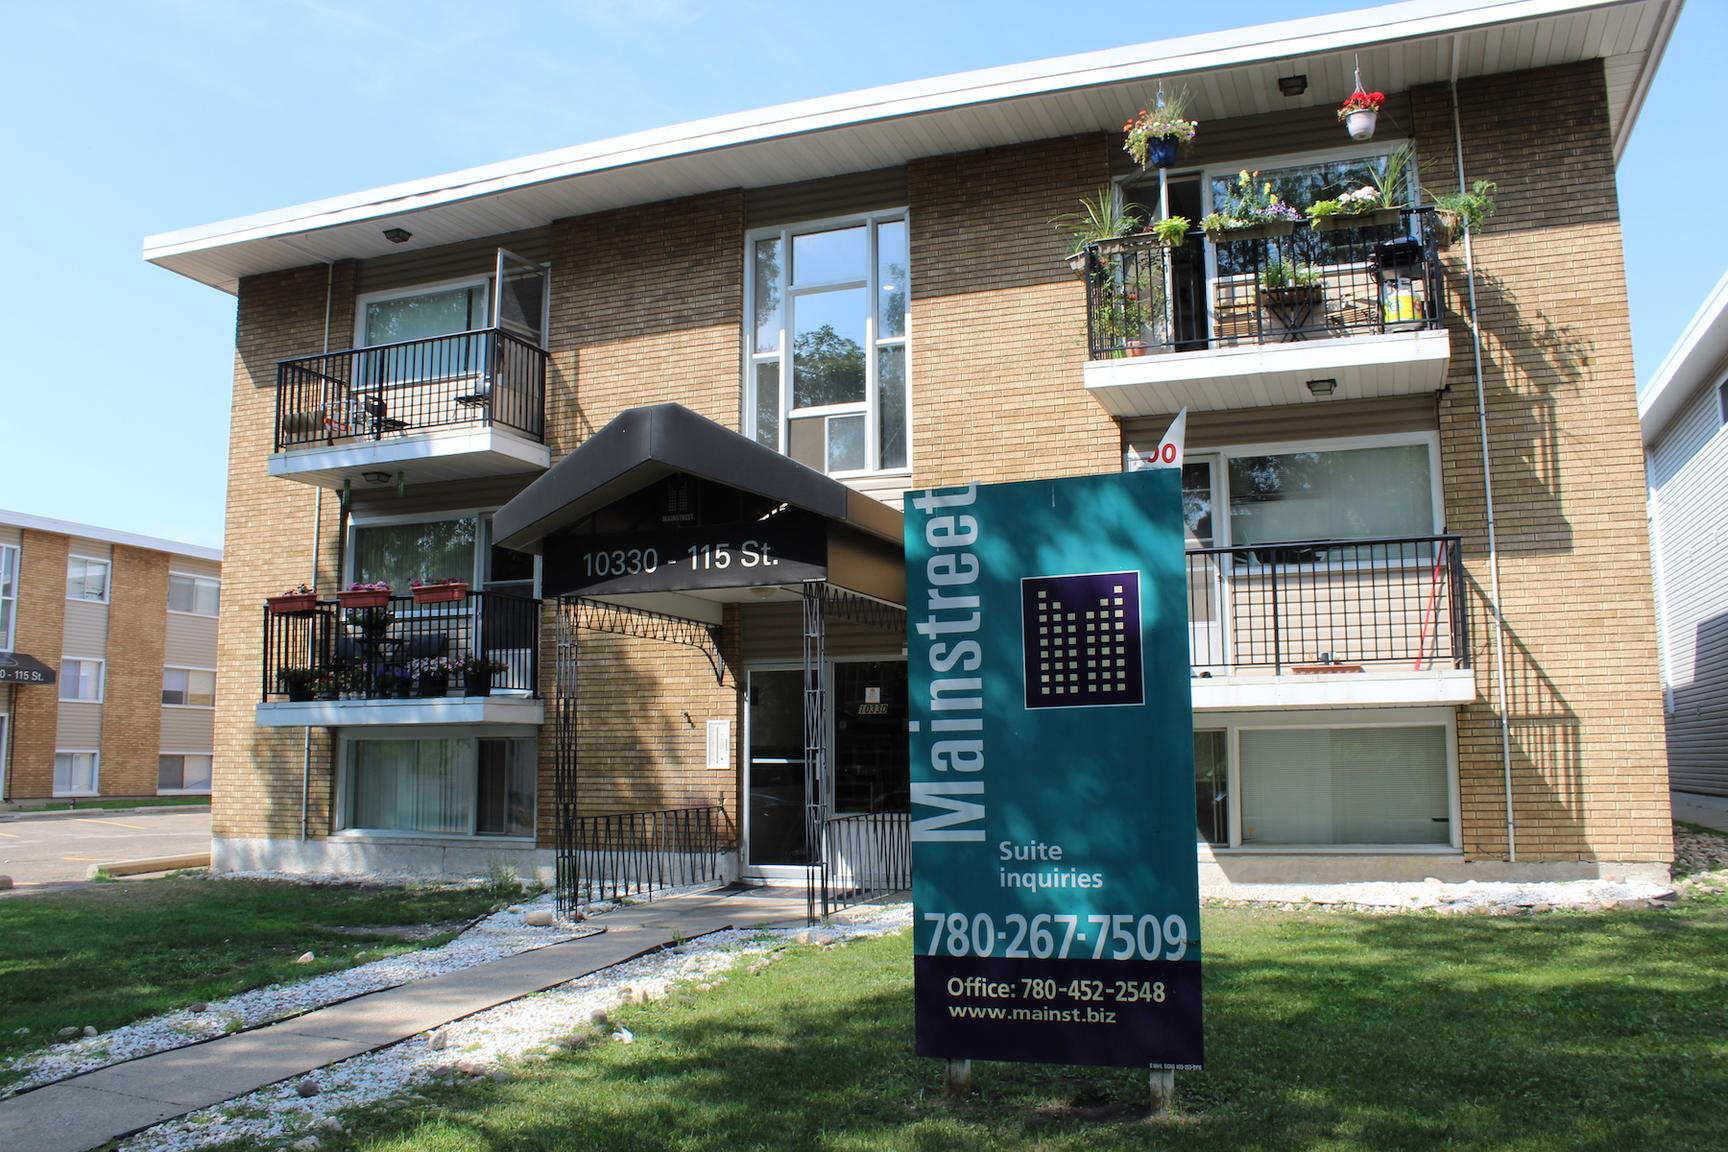 10330 115 St NW, Edmonton, AB - $799